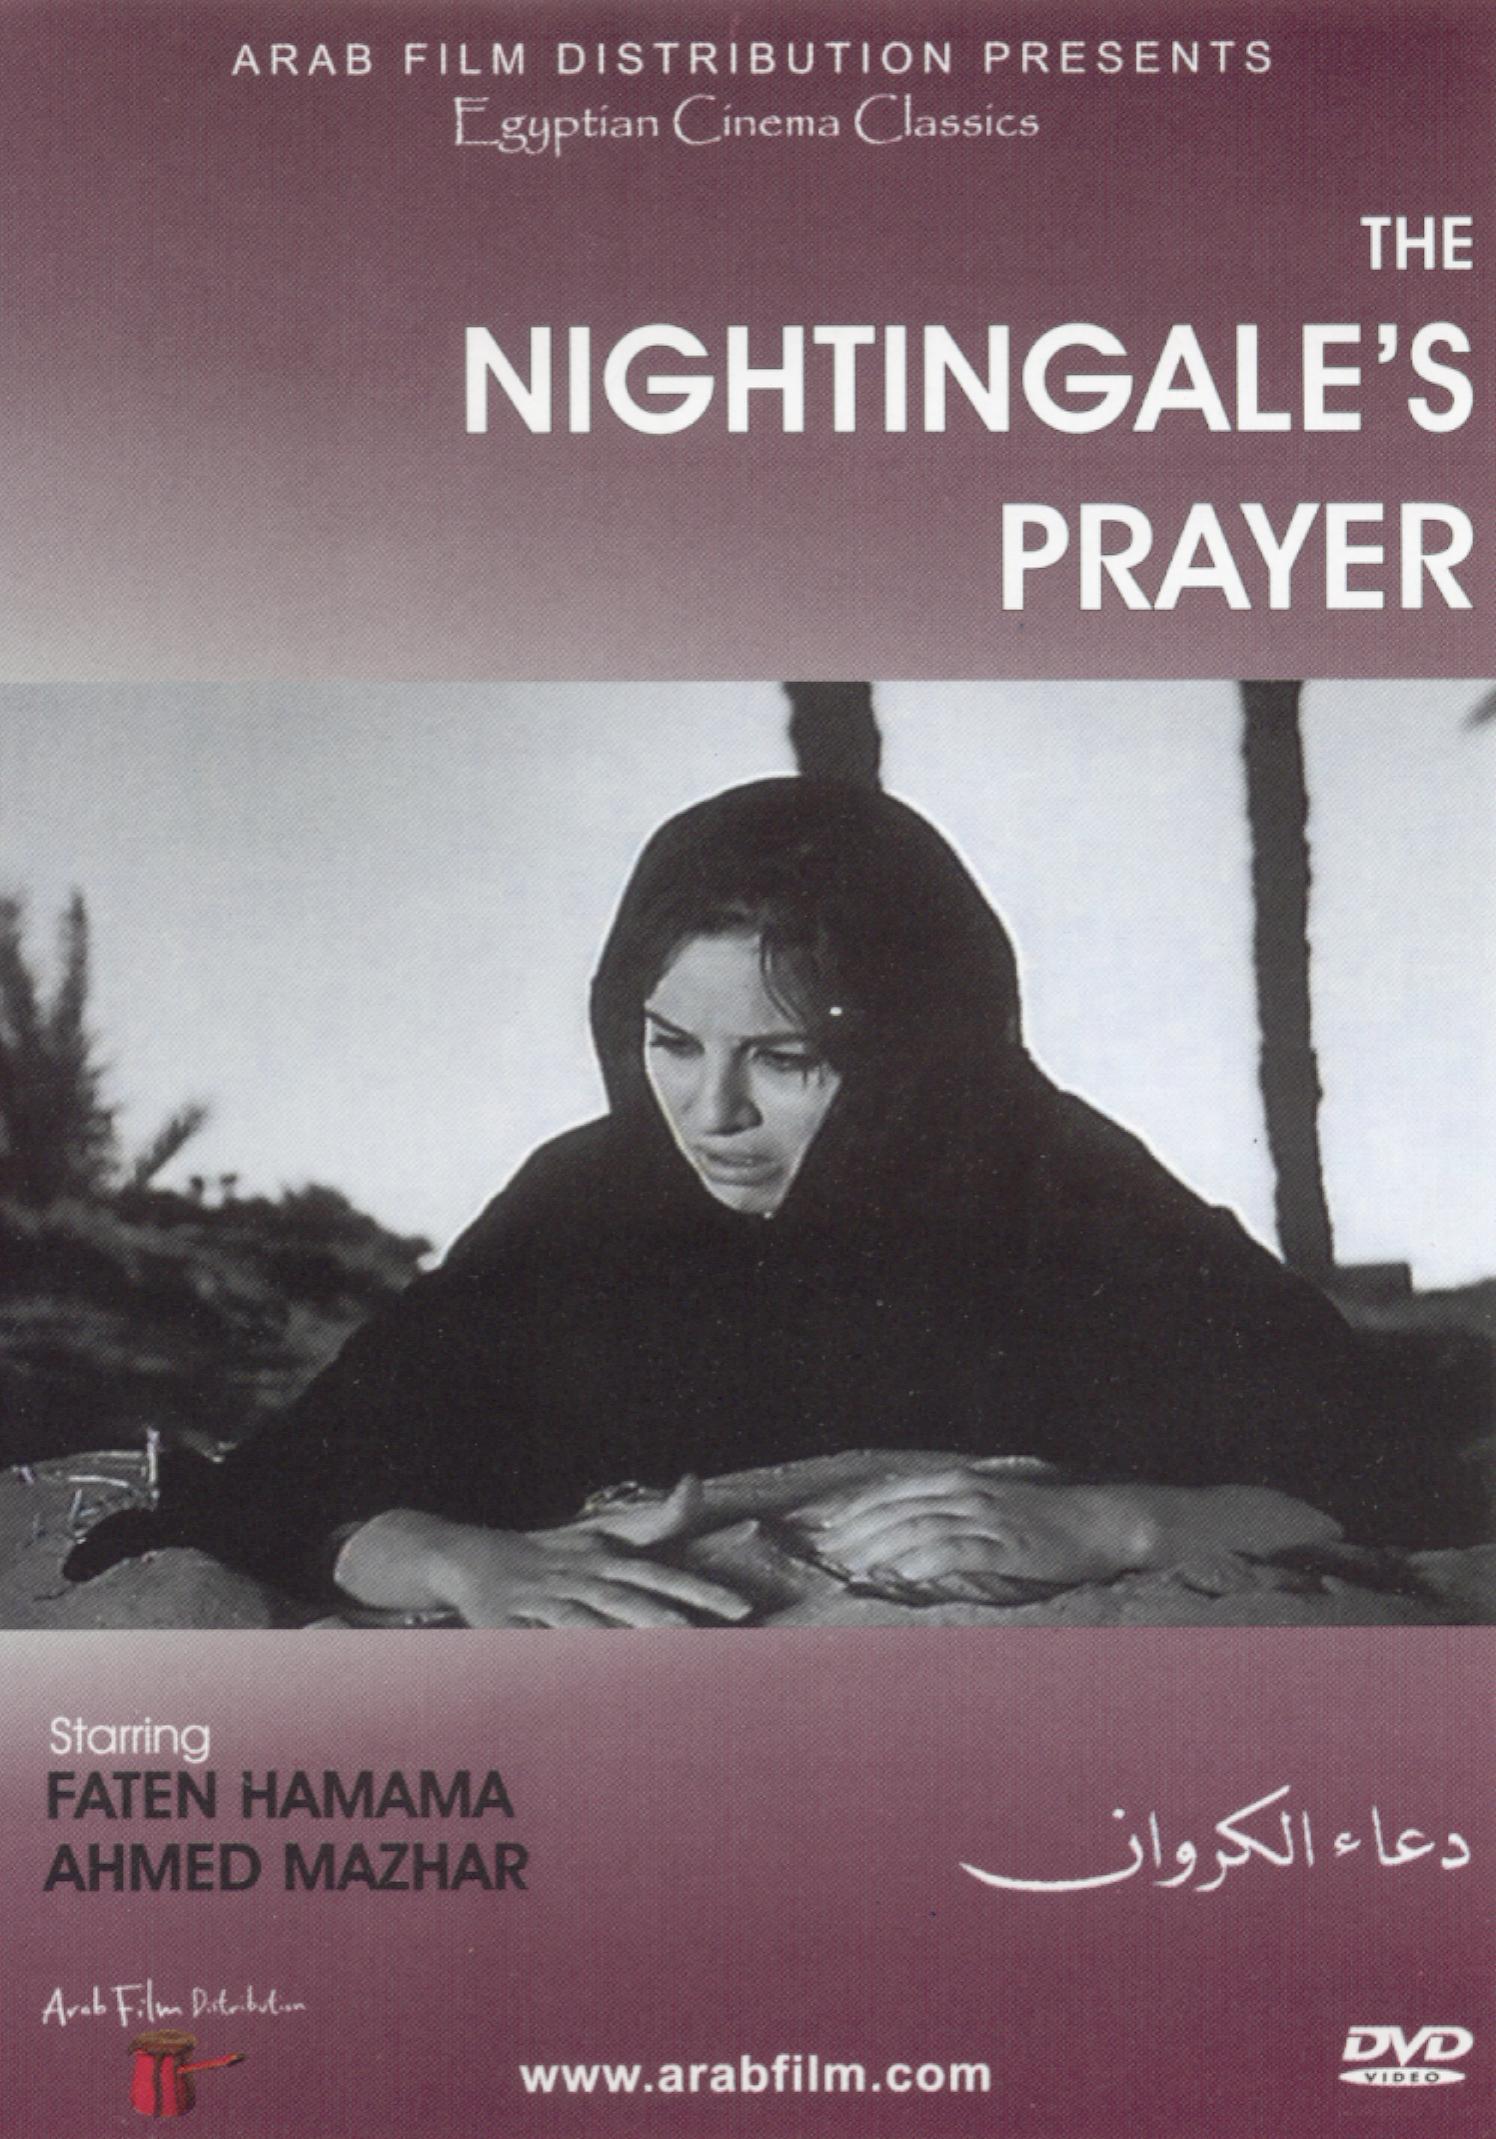 The Nightingale's Prayer